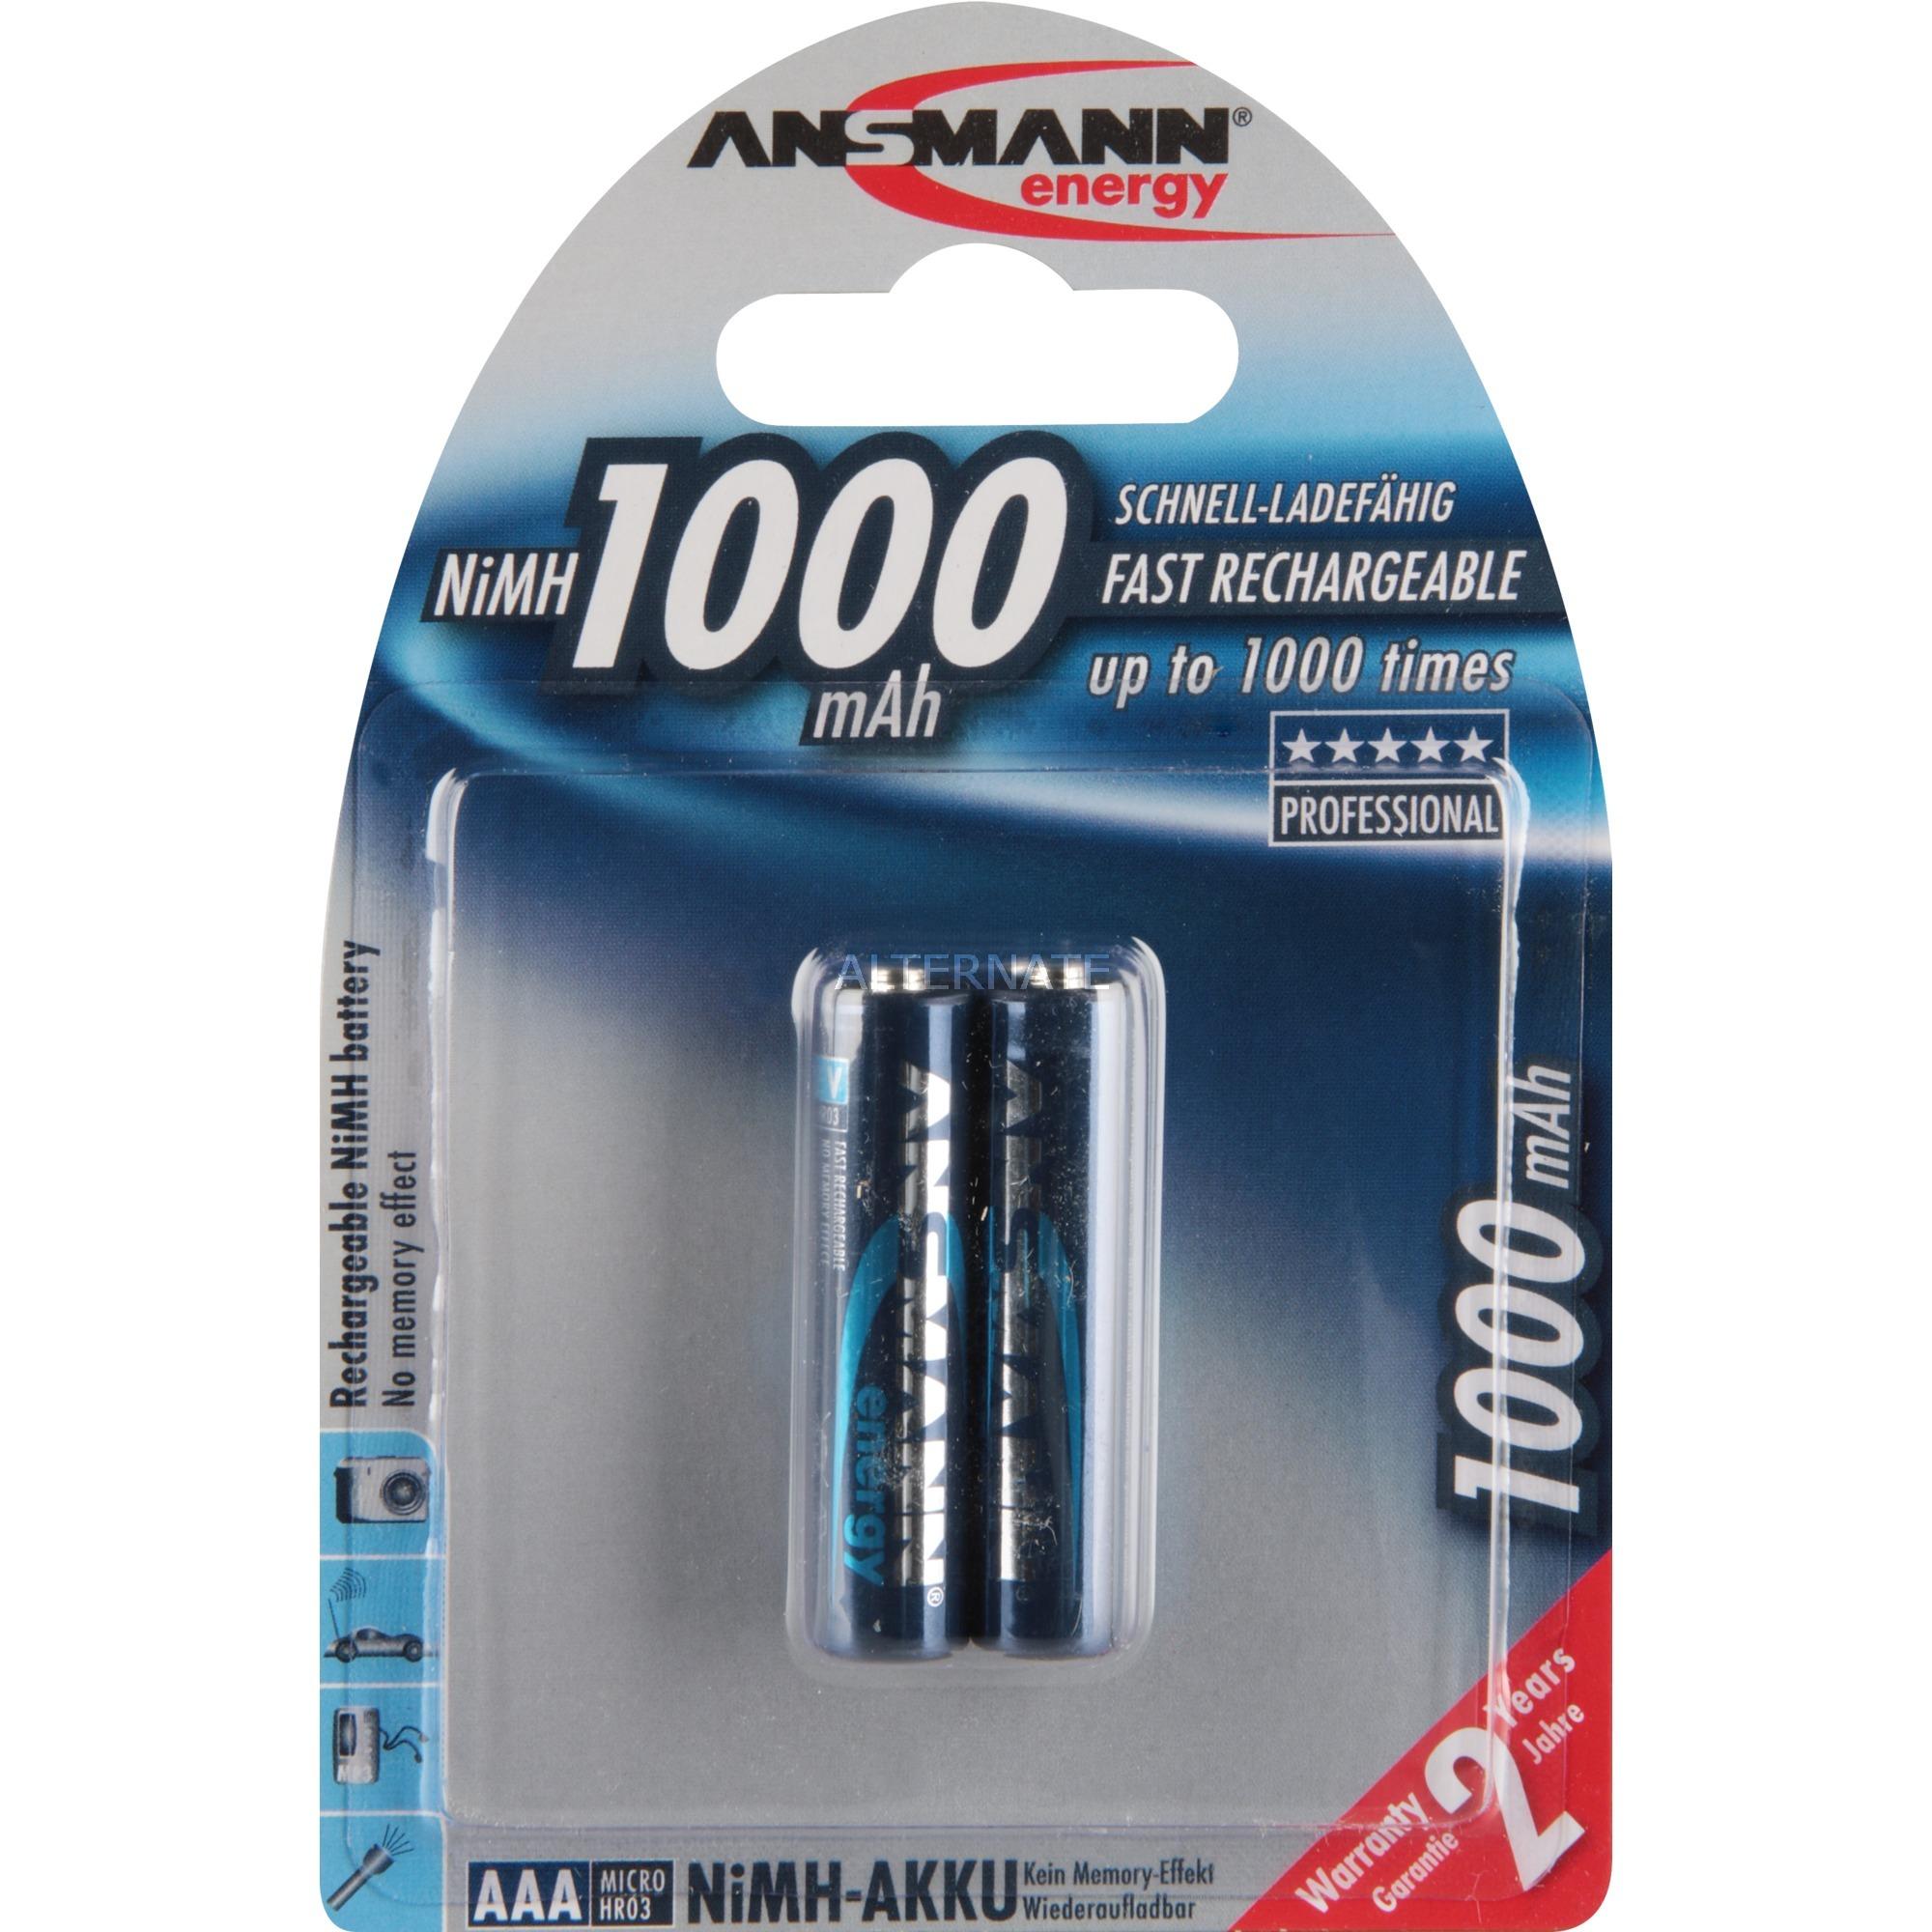 blister-2-x-accu-aaa-1000mah-nikkel-metalhydrid-nimh-1000mah-12v-genopladeligt-batteri